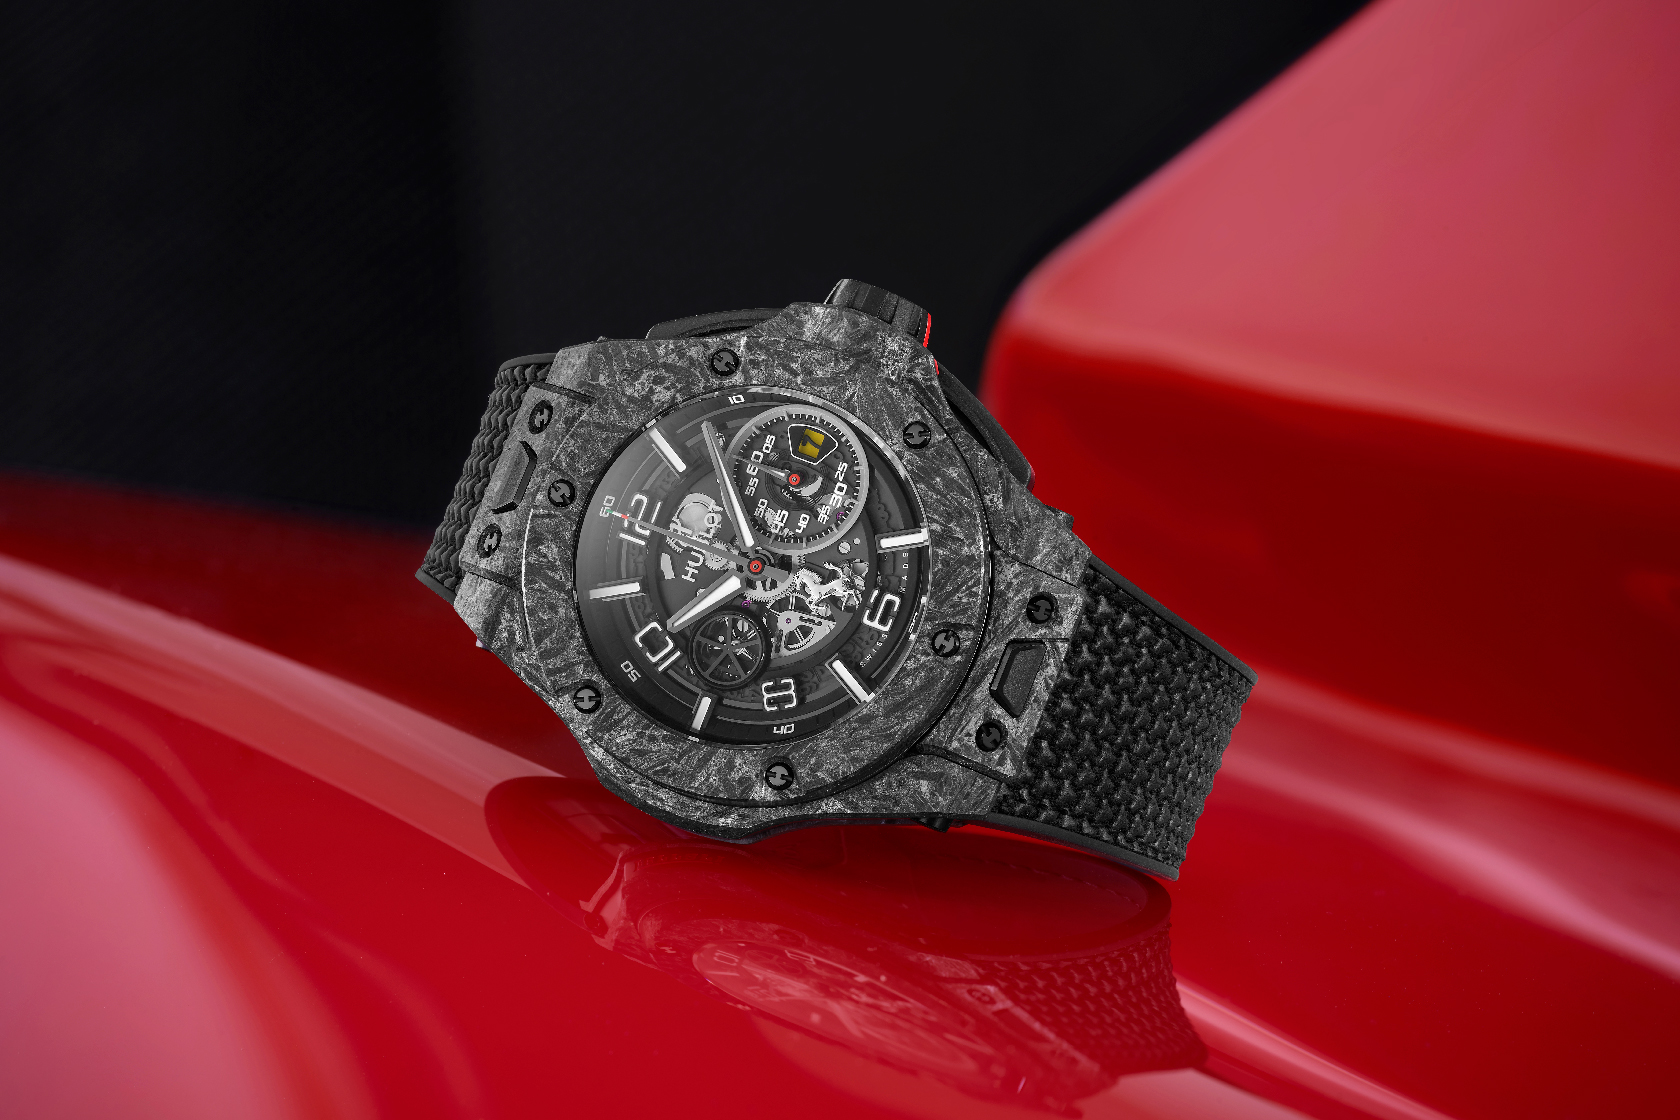 WATCH THIS|宇舶錶再展新未來,囊括英超聯賽和法拉利賽事